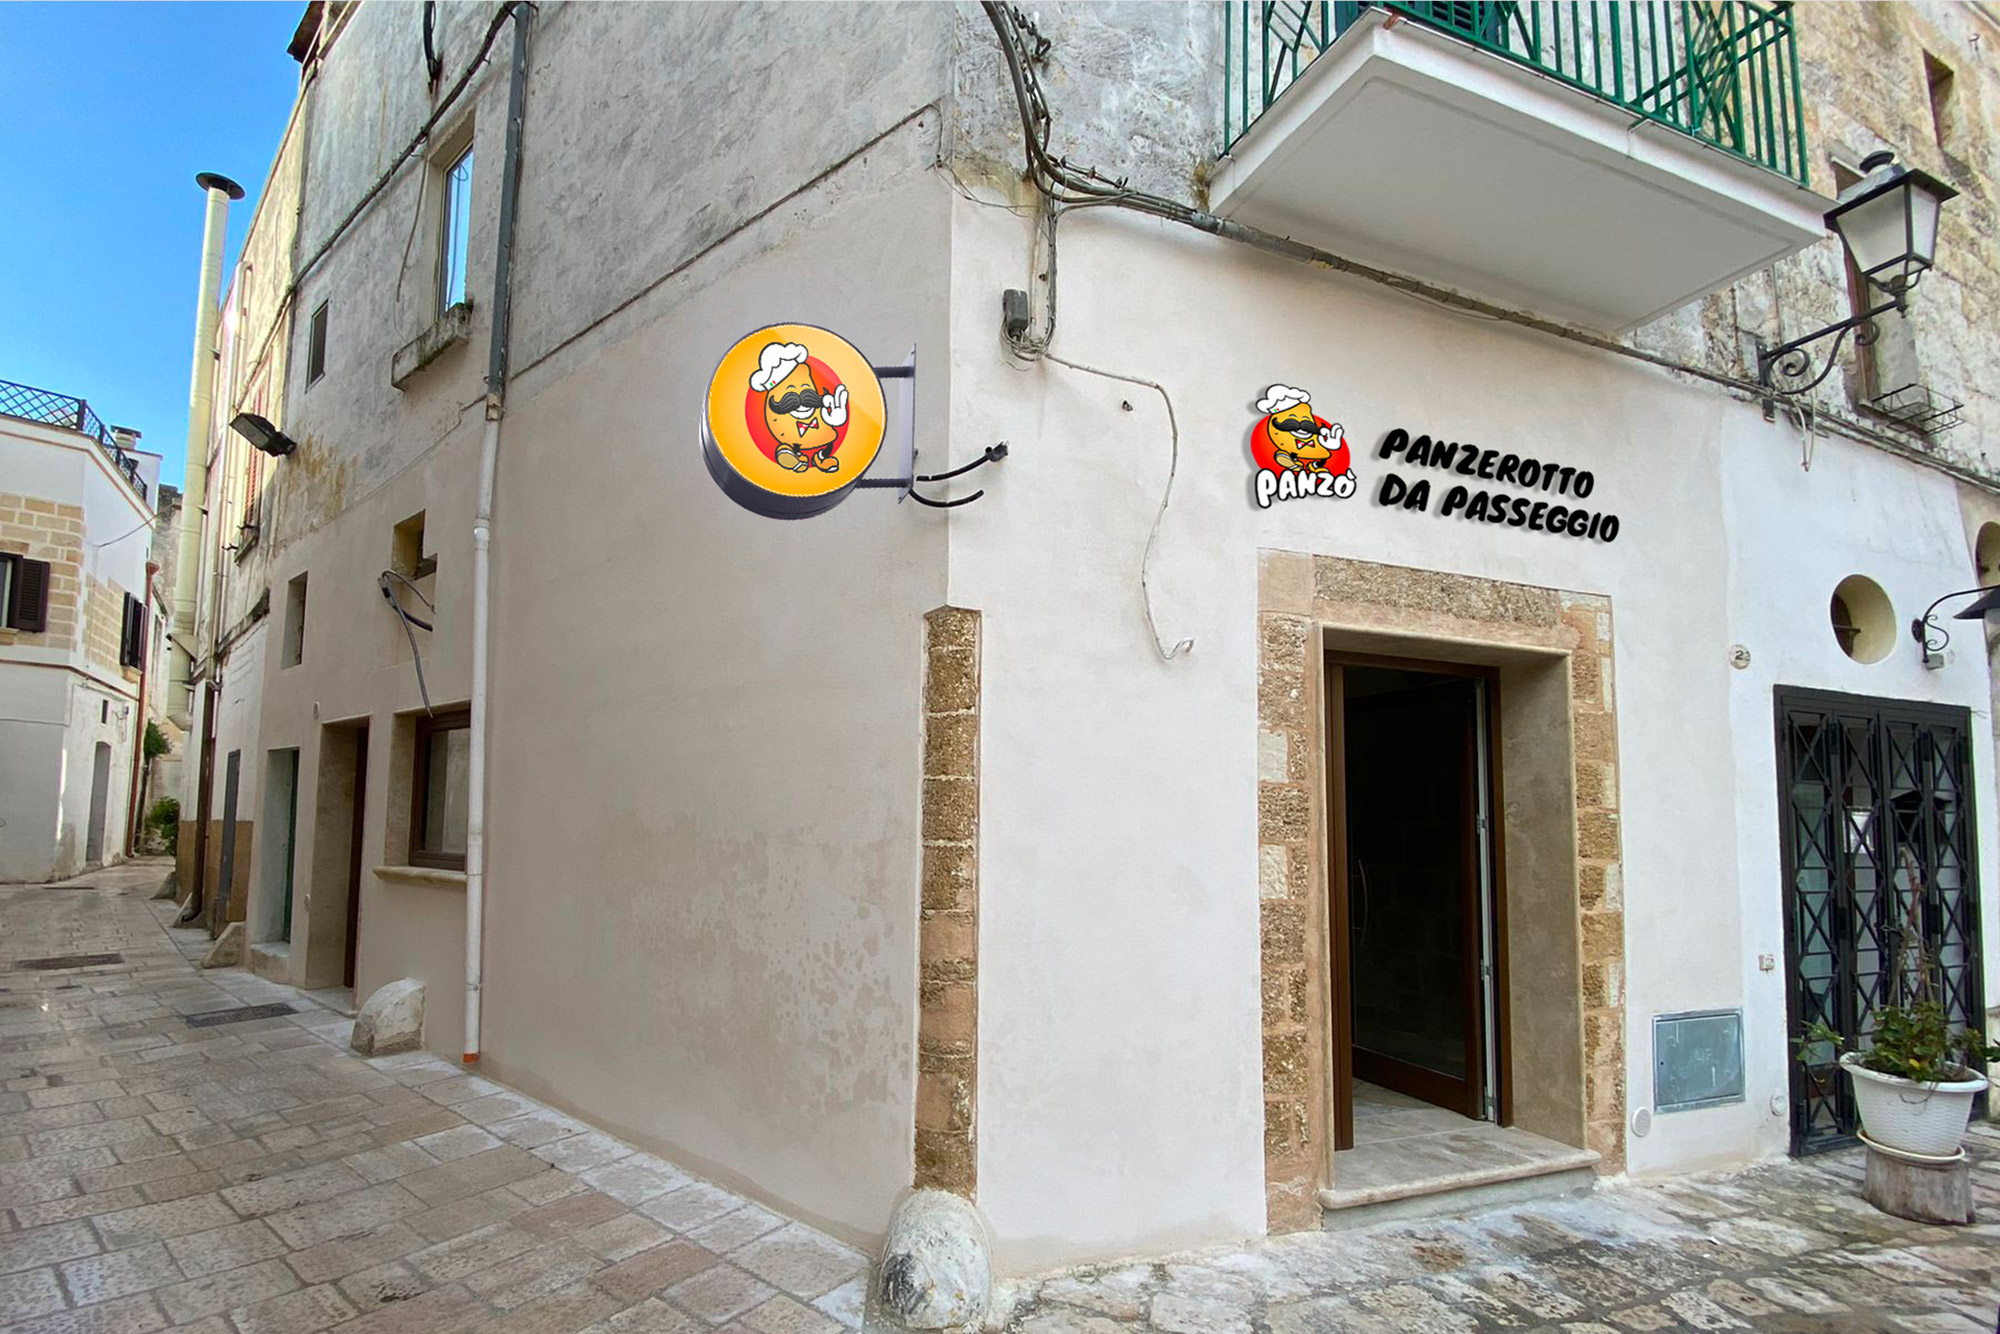 Panzò - Panzerotto da passeggio - logo, branding - img 8